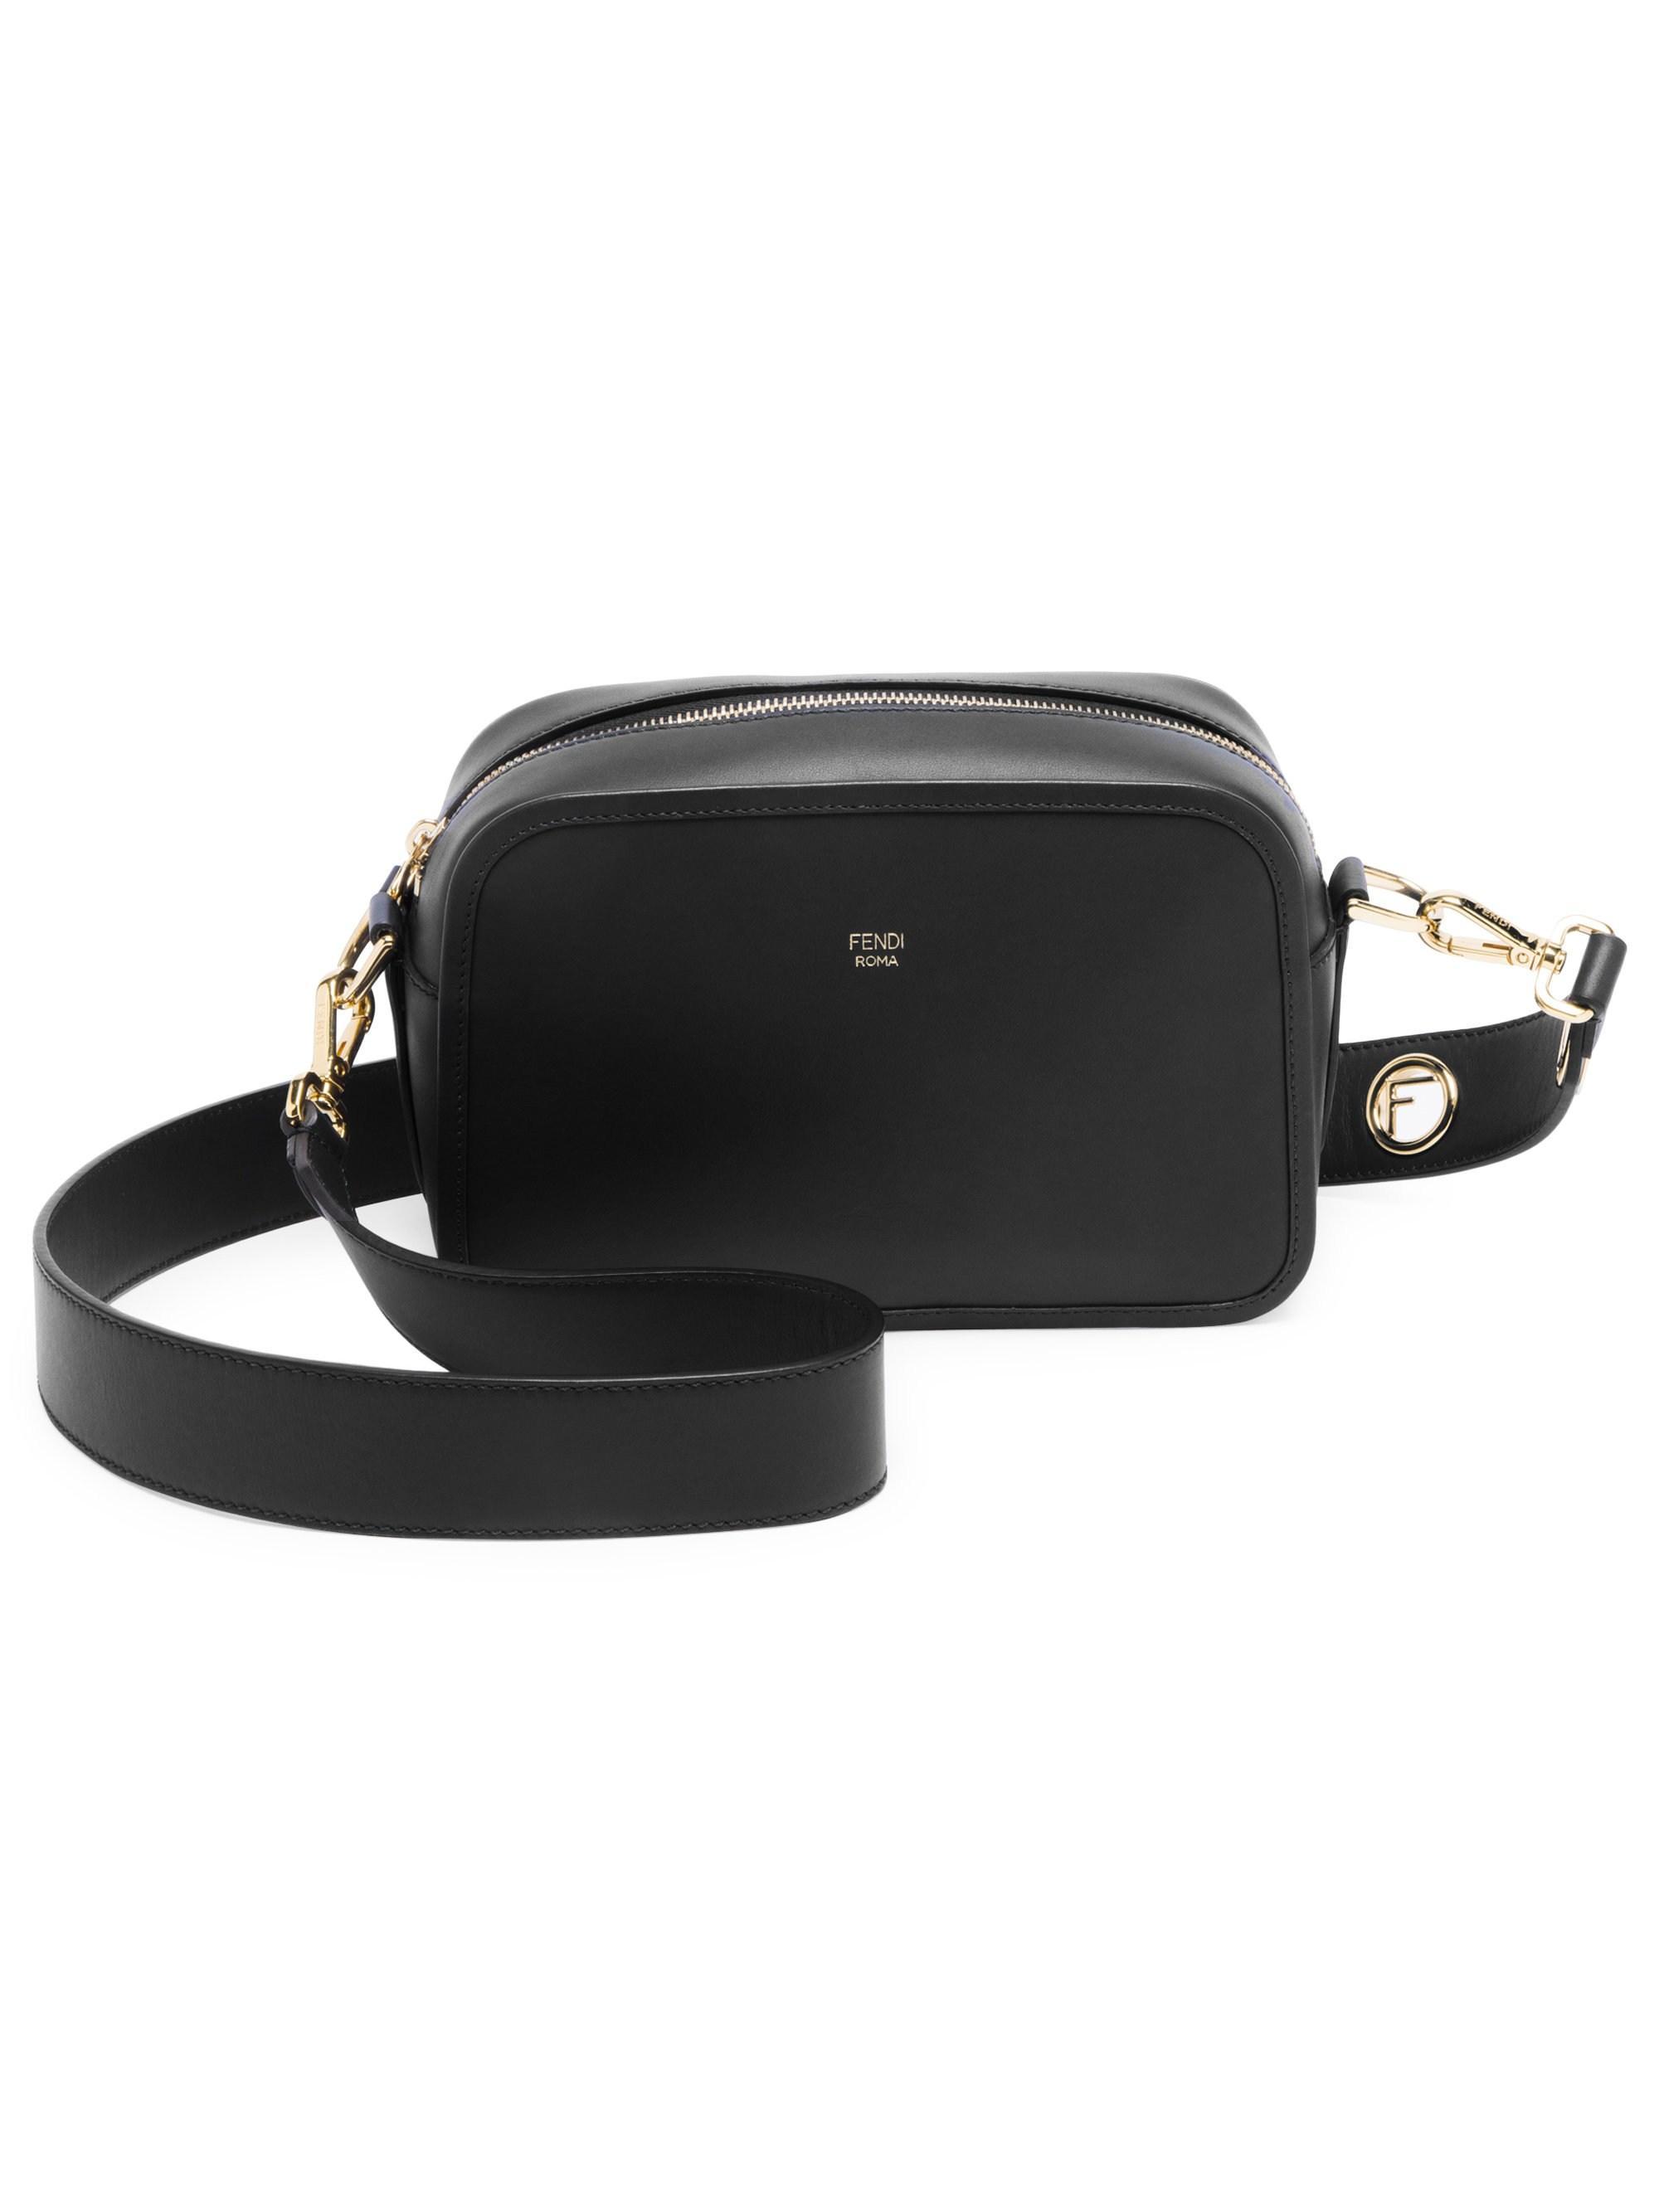 Lyst - Fendi Women s Camera Leather Crossbody Bag - Black in Black 3221f9c1f685d